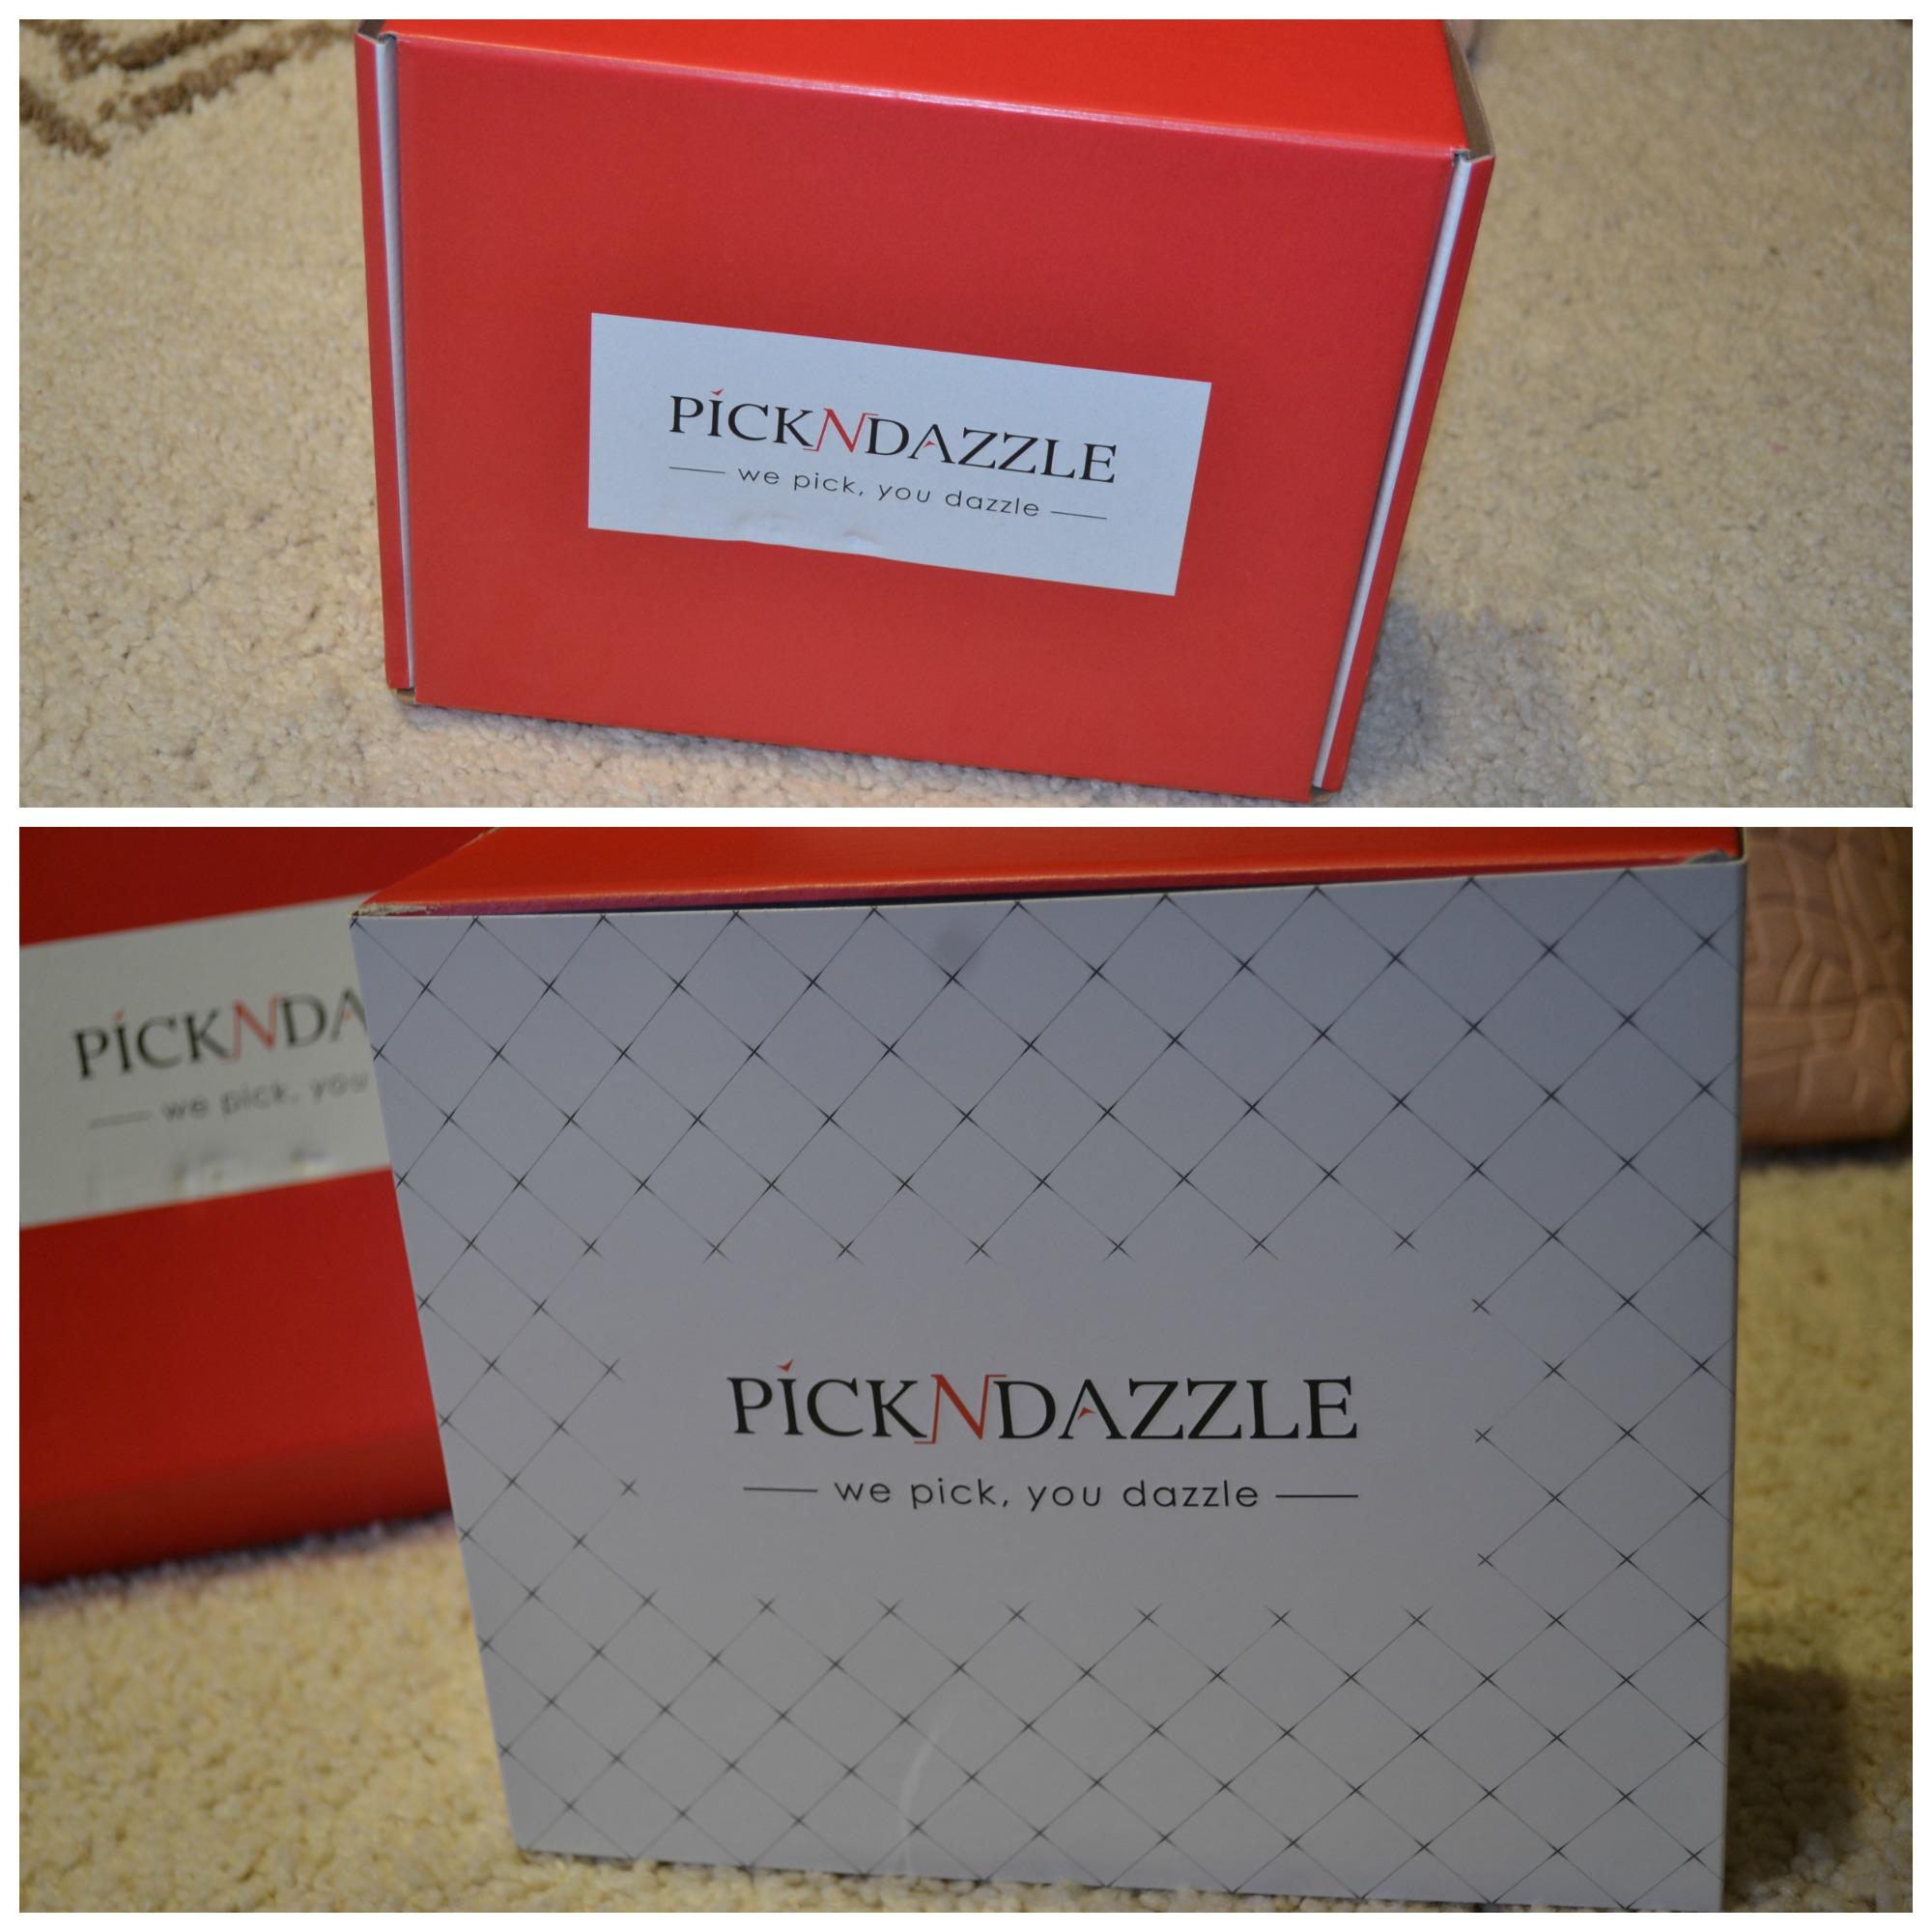 pickndazzle